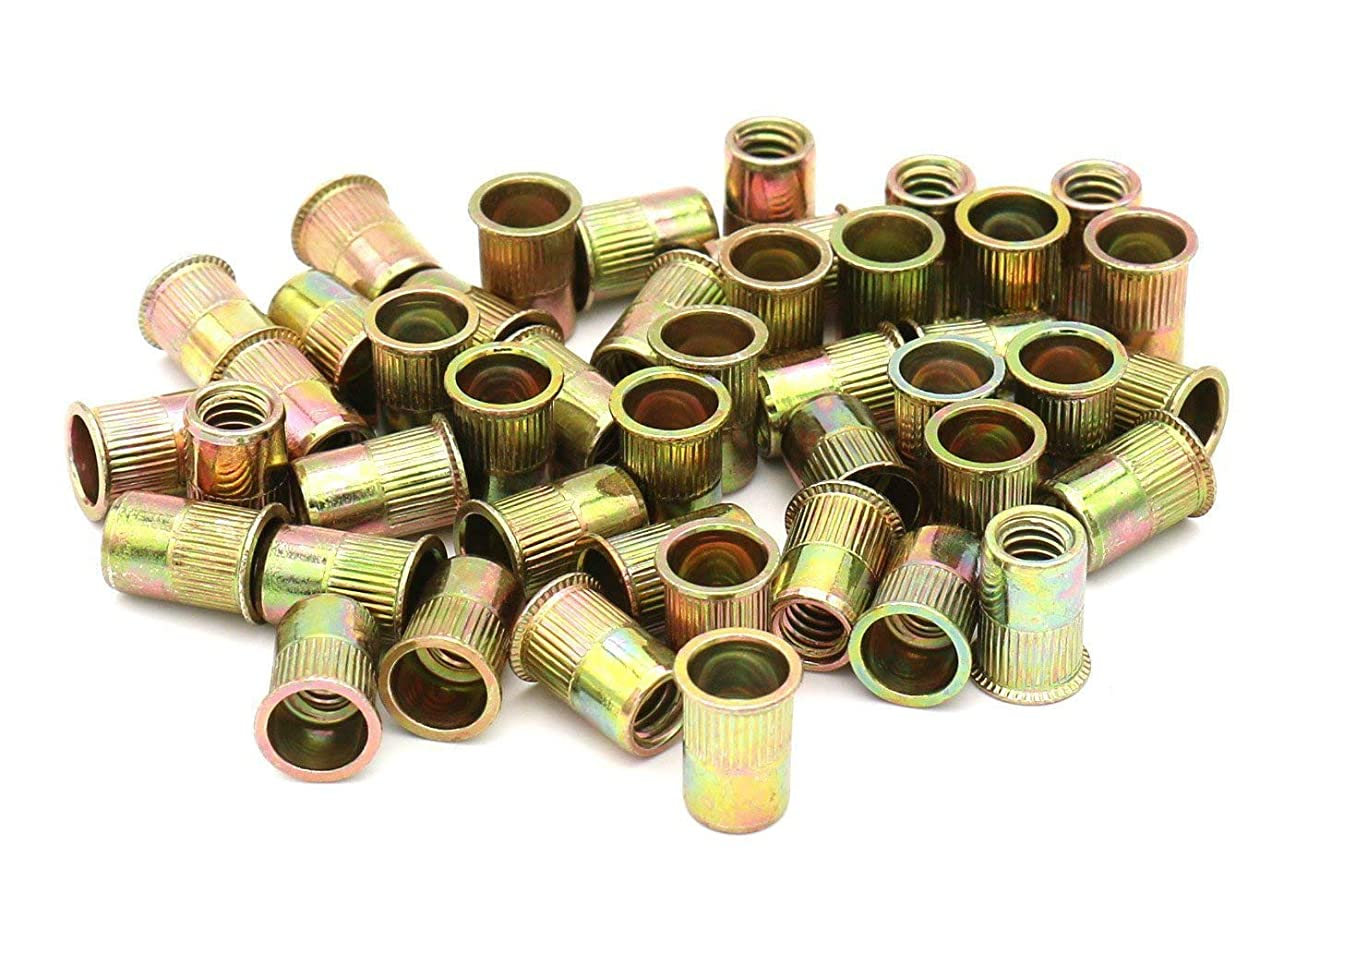 Zinc Plated Carbon Steel Rivet Nut Flat Head Insert Nutsert Pack of 50 (1/2-13)